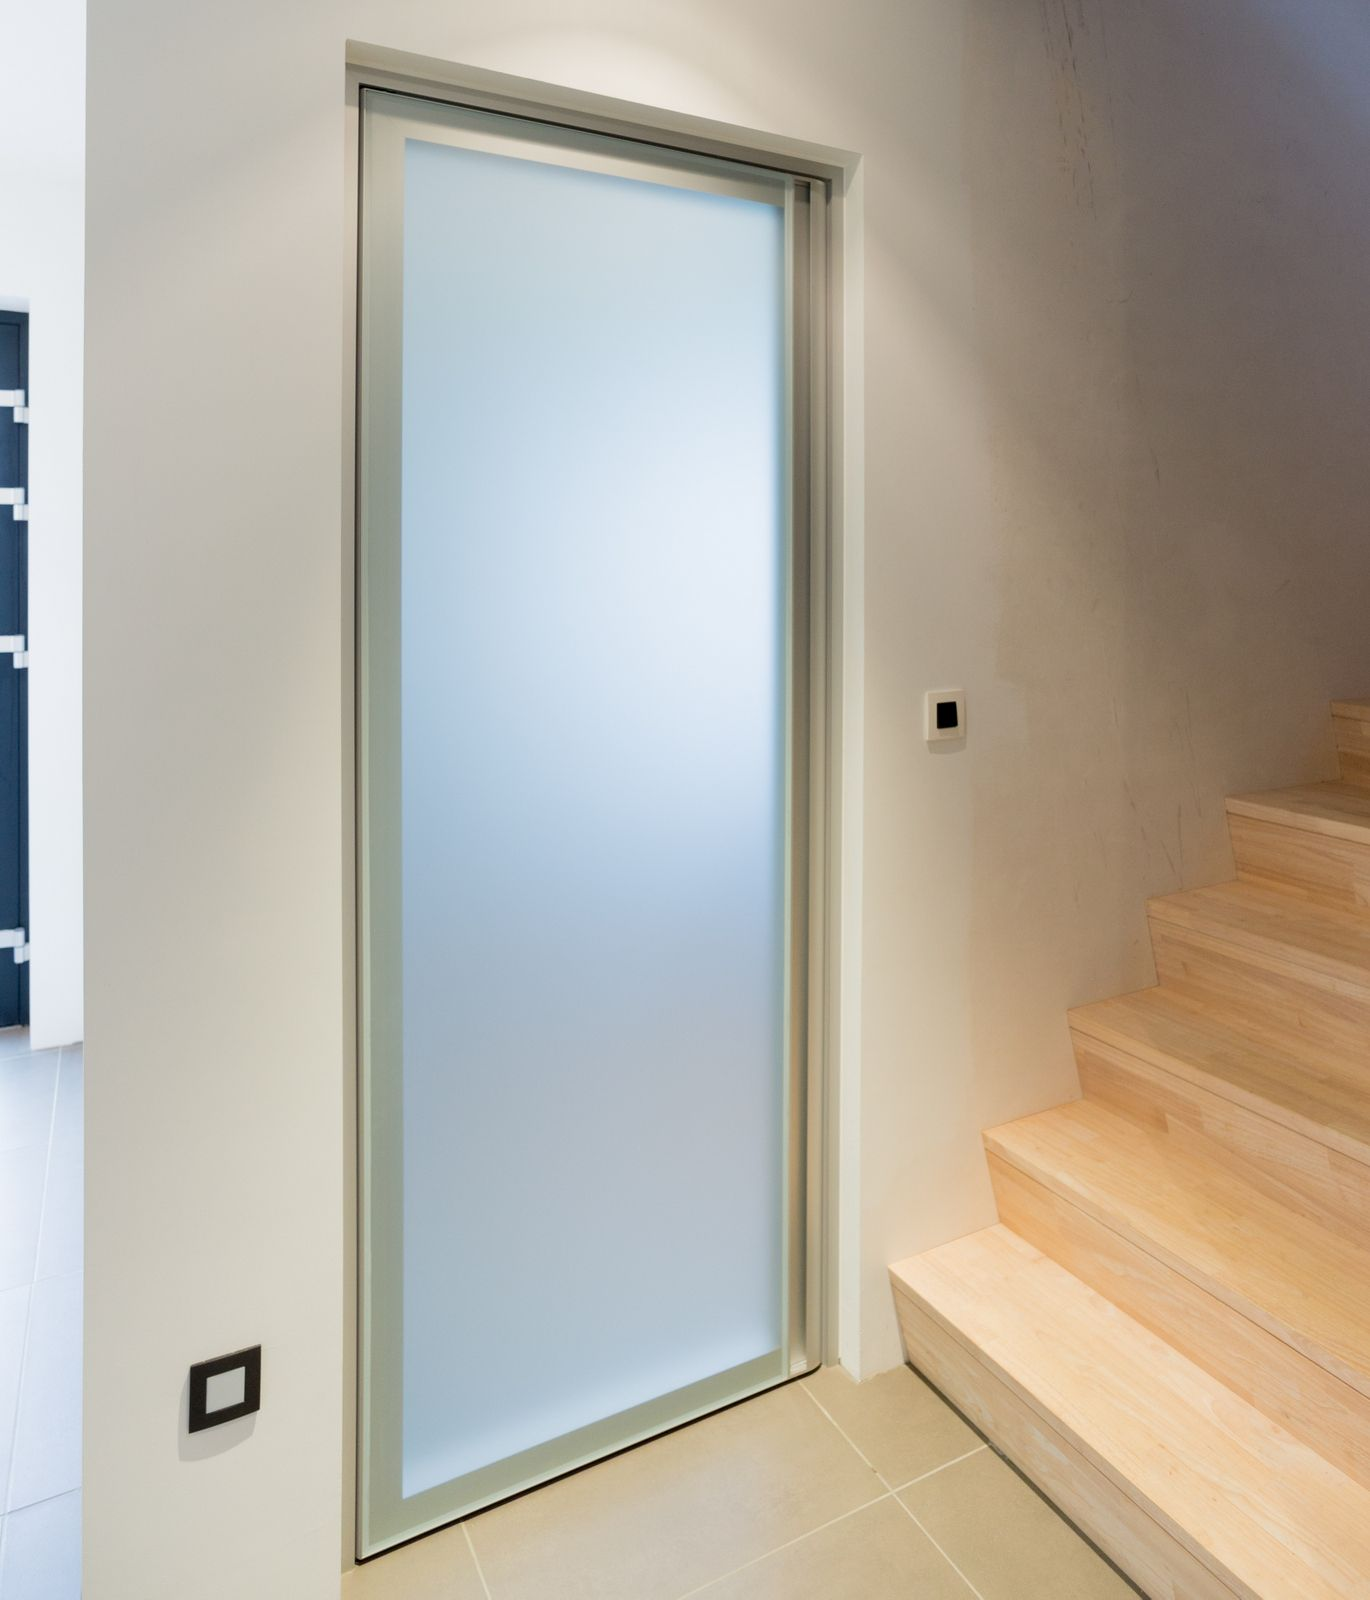 Awesome Glazen Deur Badkamer Contemporary - Decorating Design ...